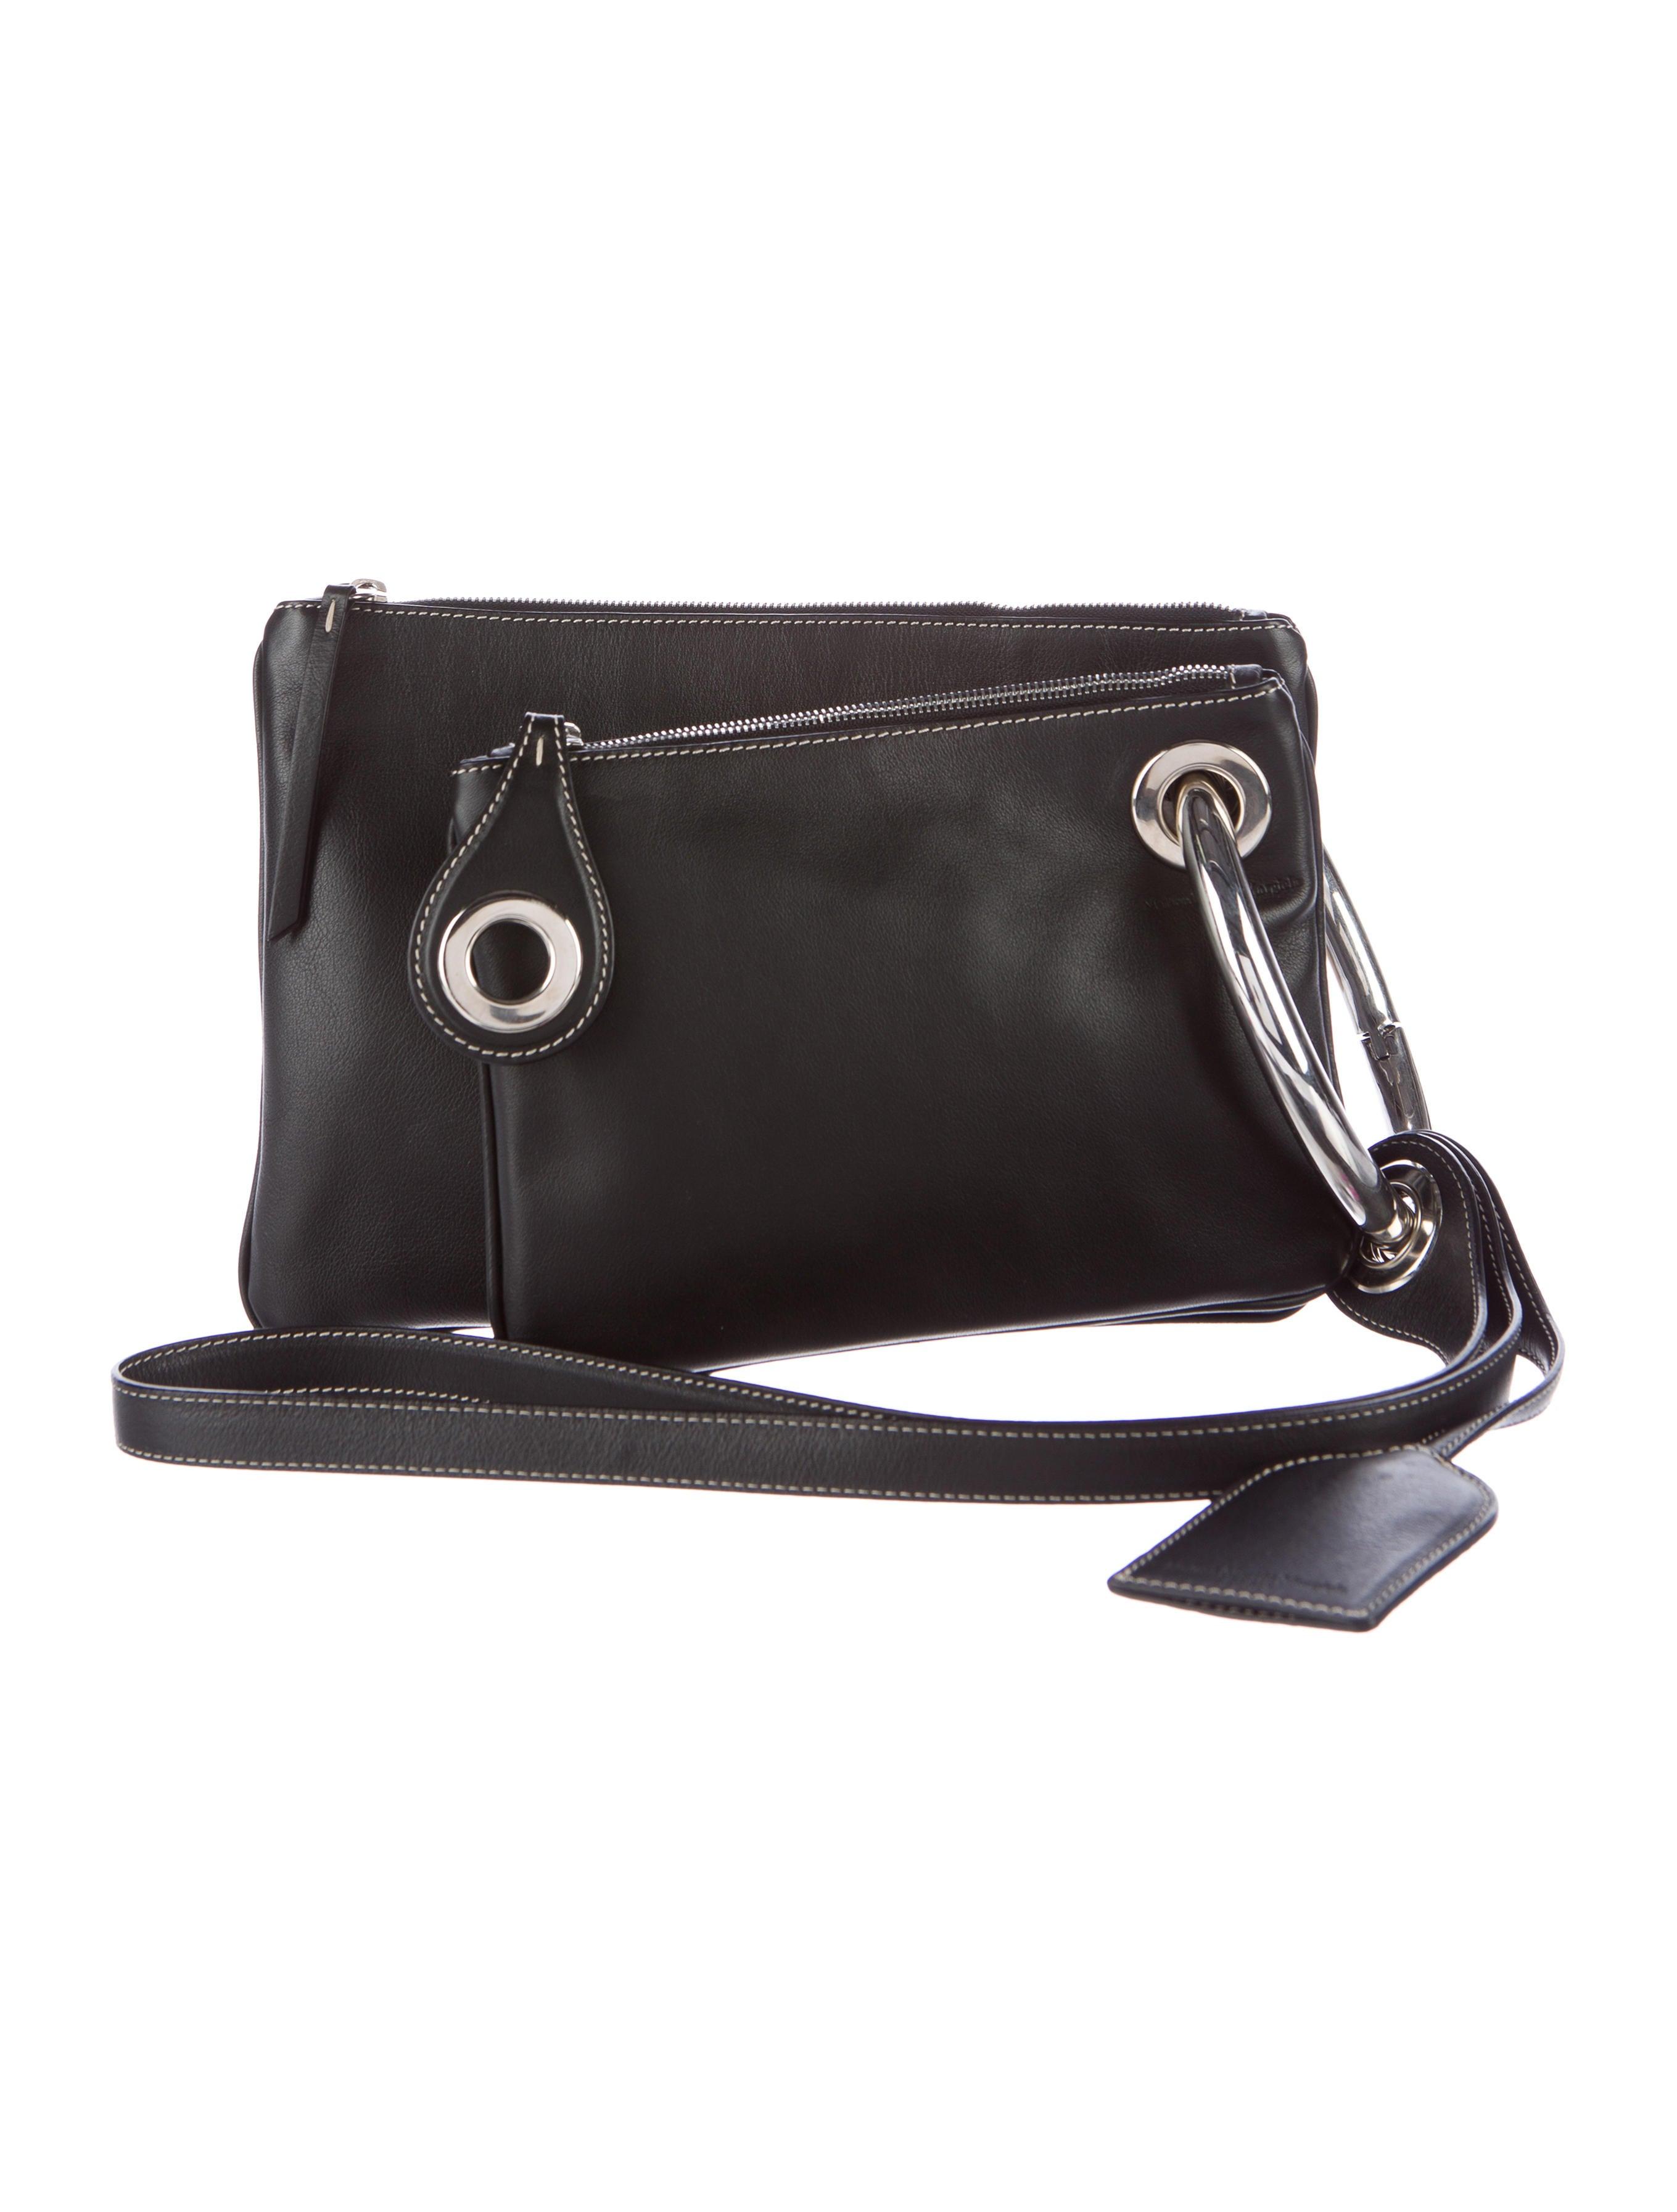 maison margiela leather clutch duo handbags mai29900 the realreal. Black Bedroom Furniture Sets. Home Design Ideas